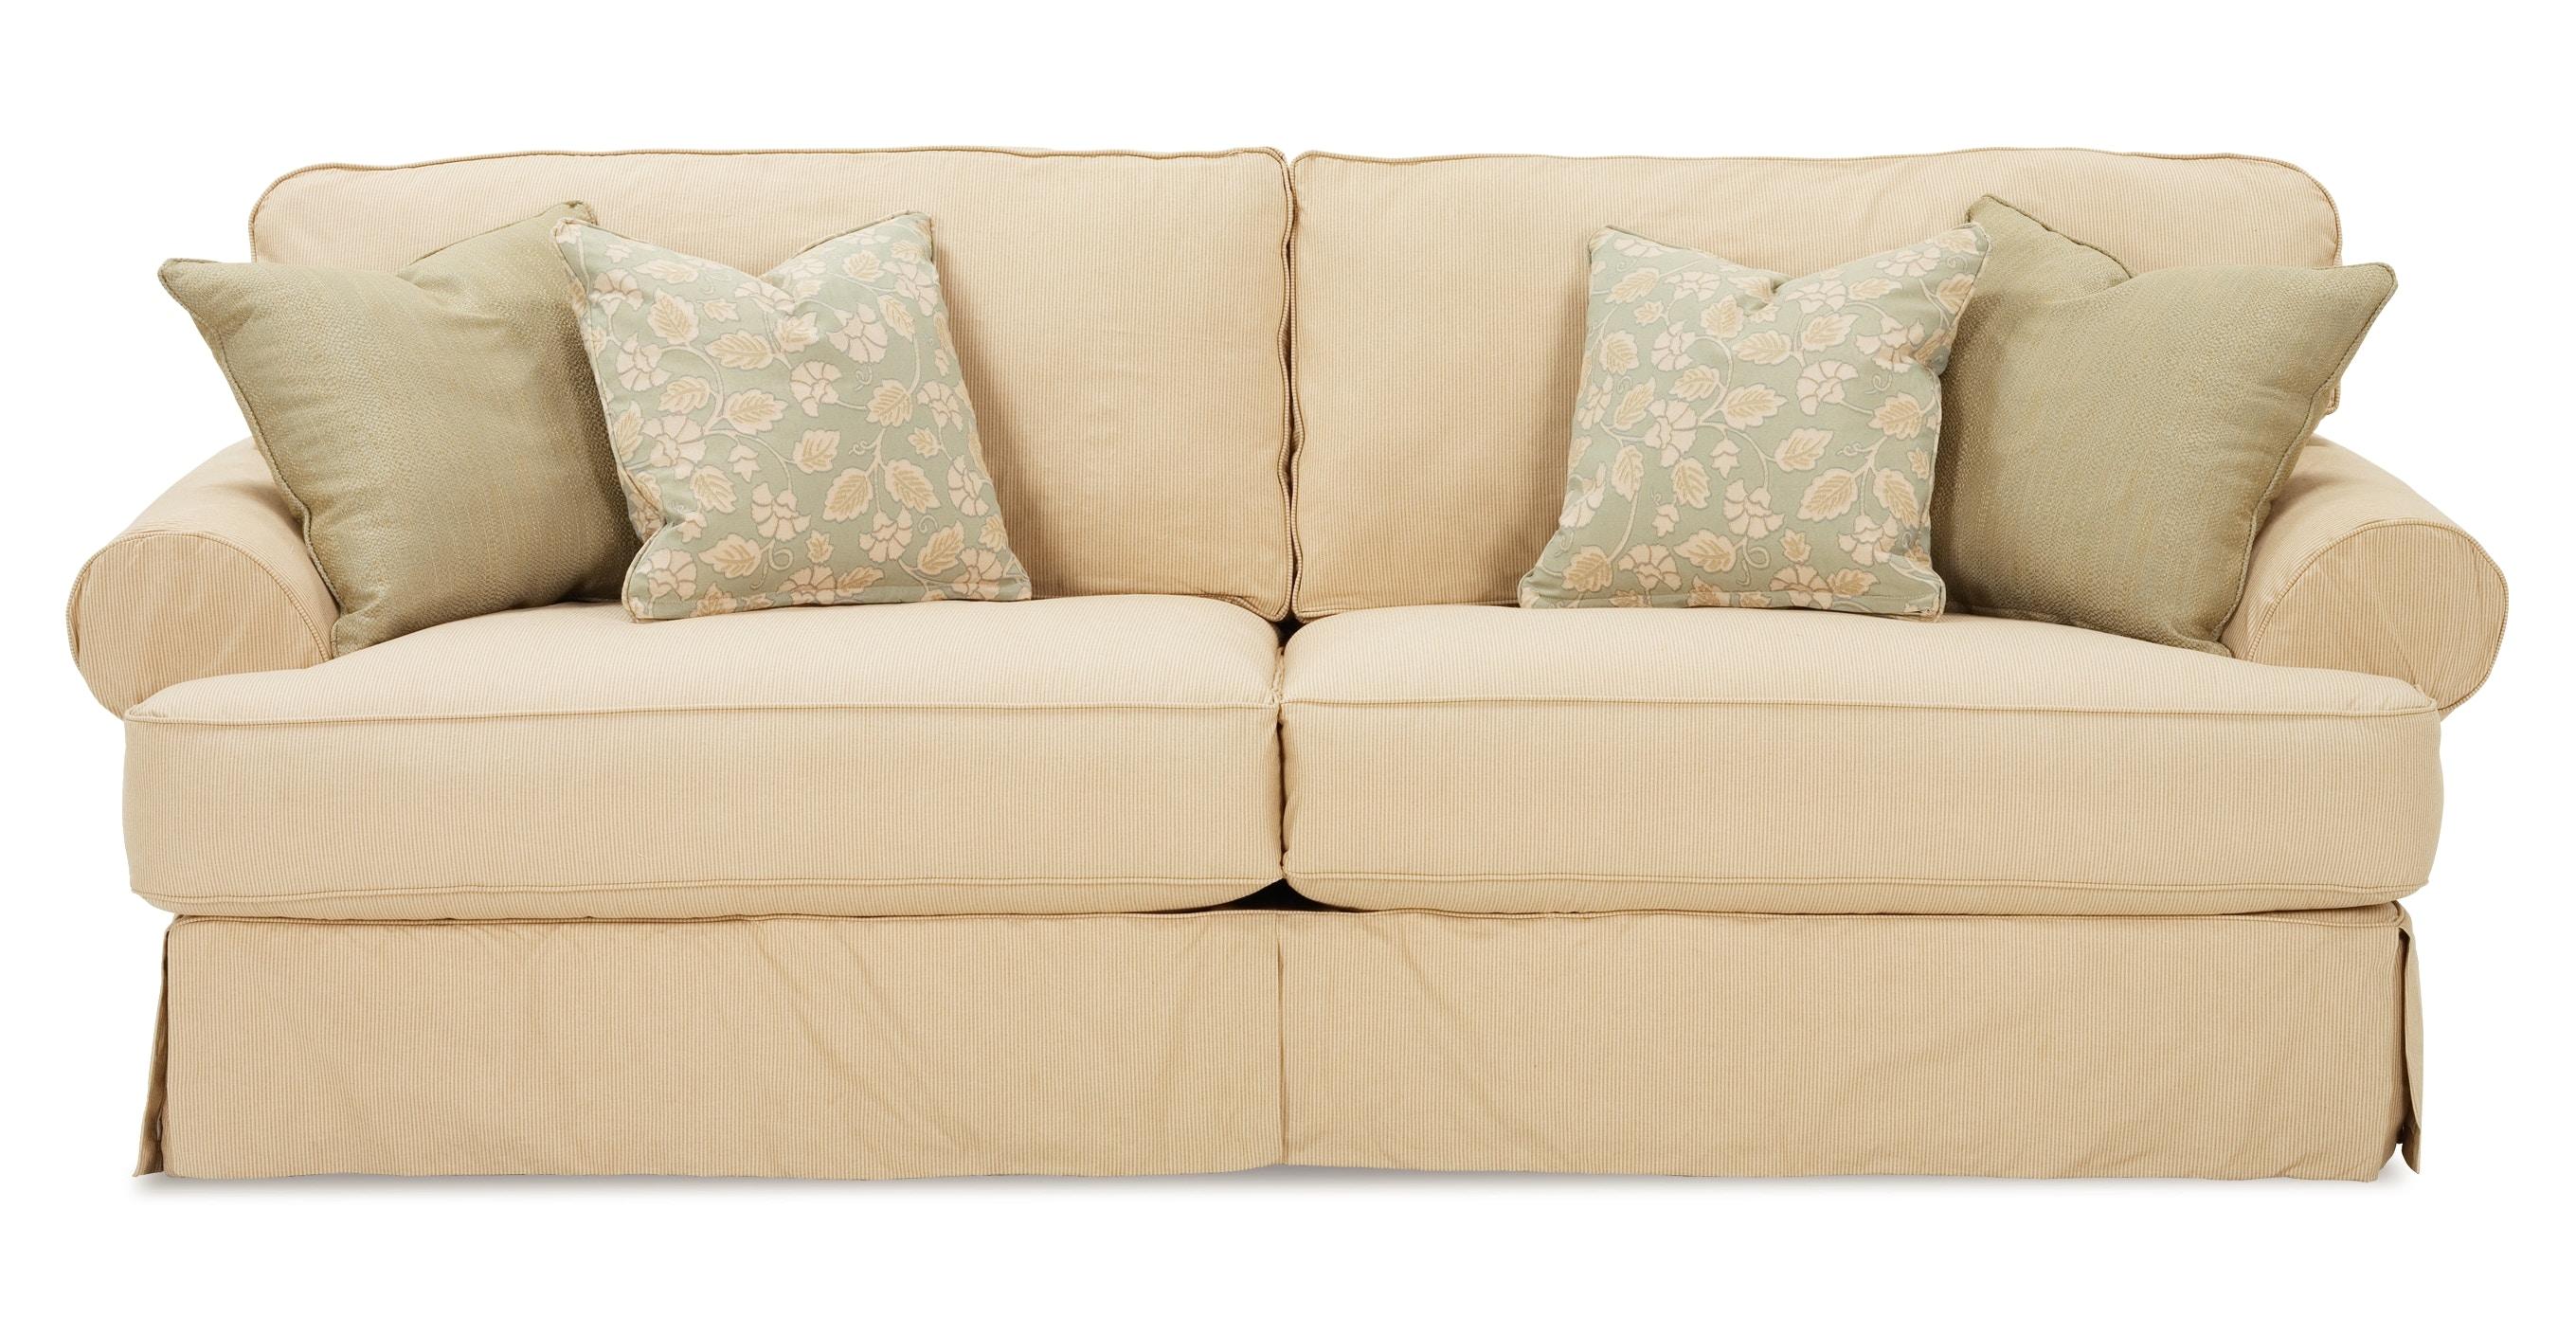 Delicieux Rowe Addison/Montecristo Two Cushion Sofa 7860